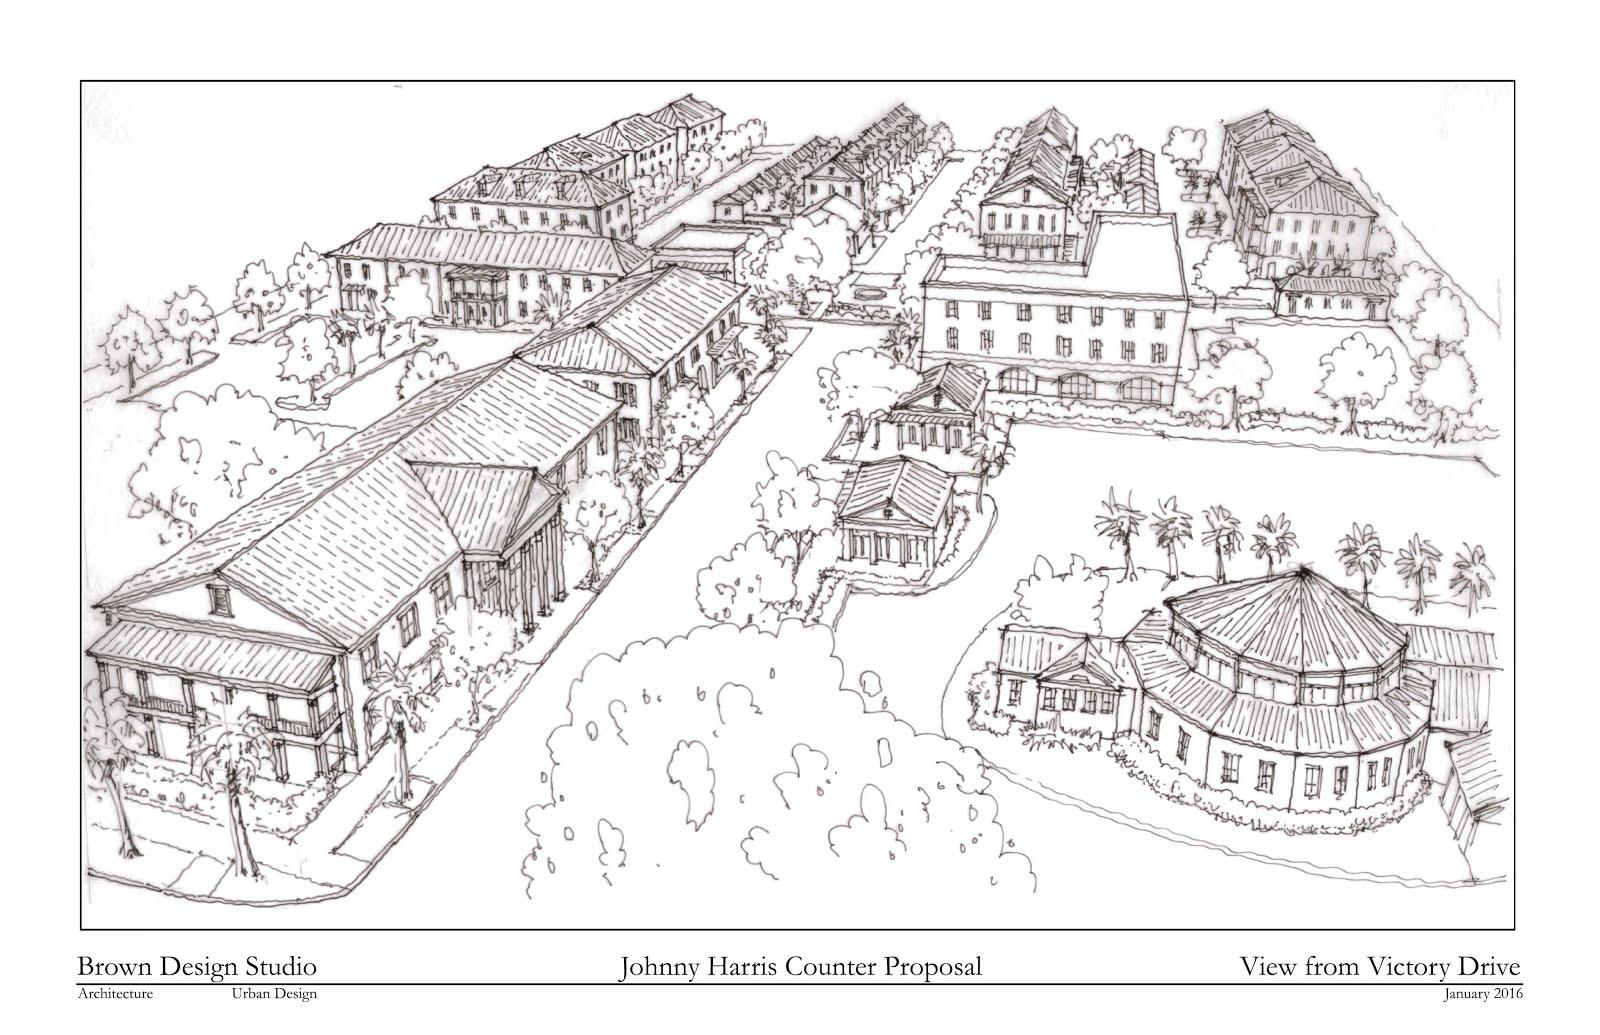 brown design studio architecture and urban design counter counter proposal the johnny harris site